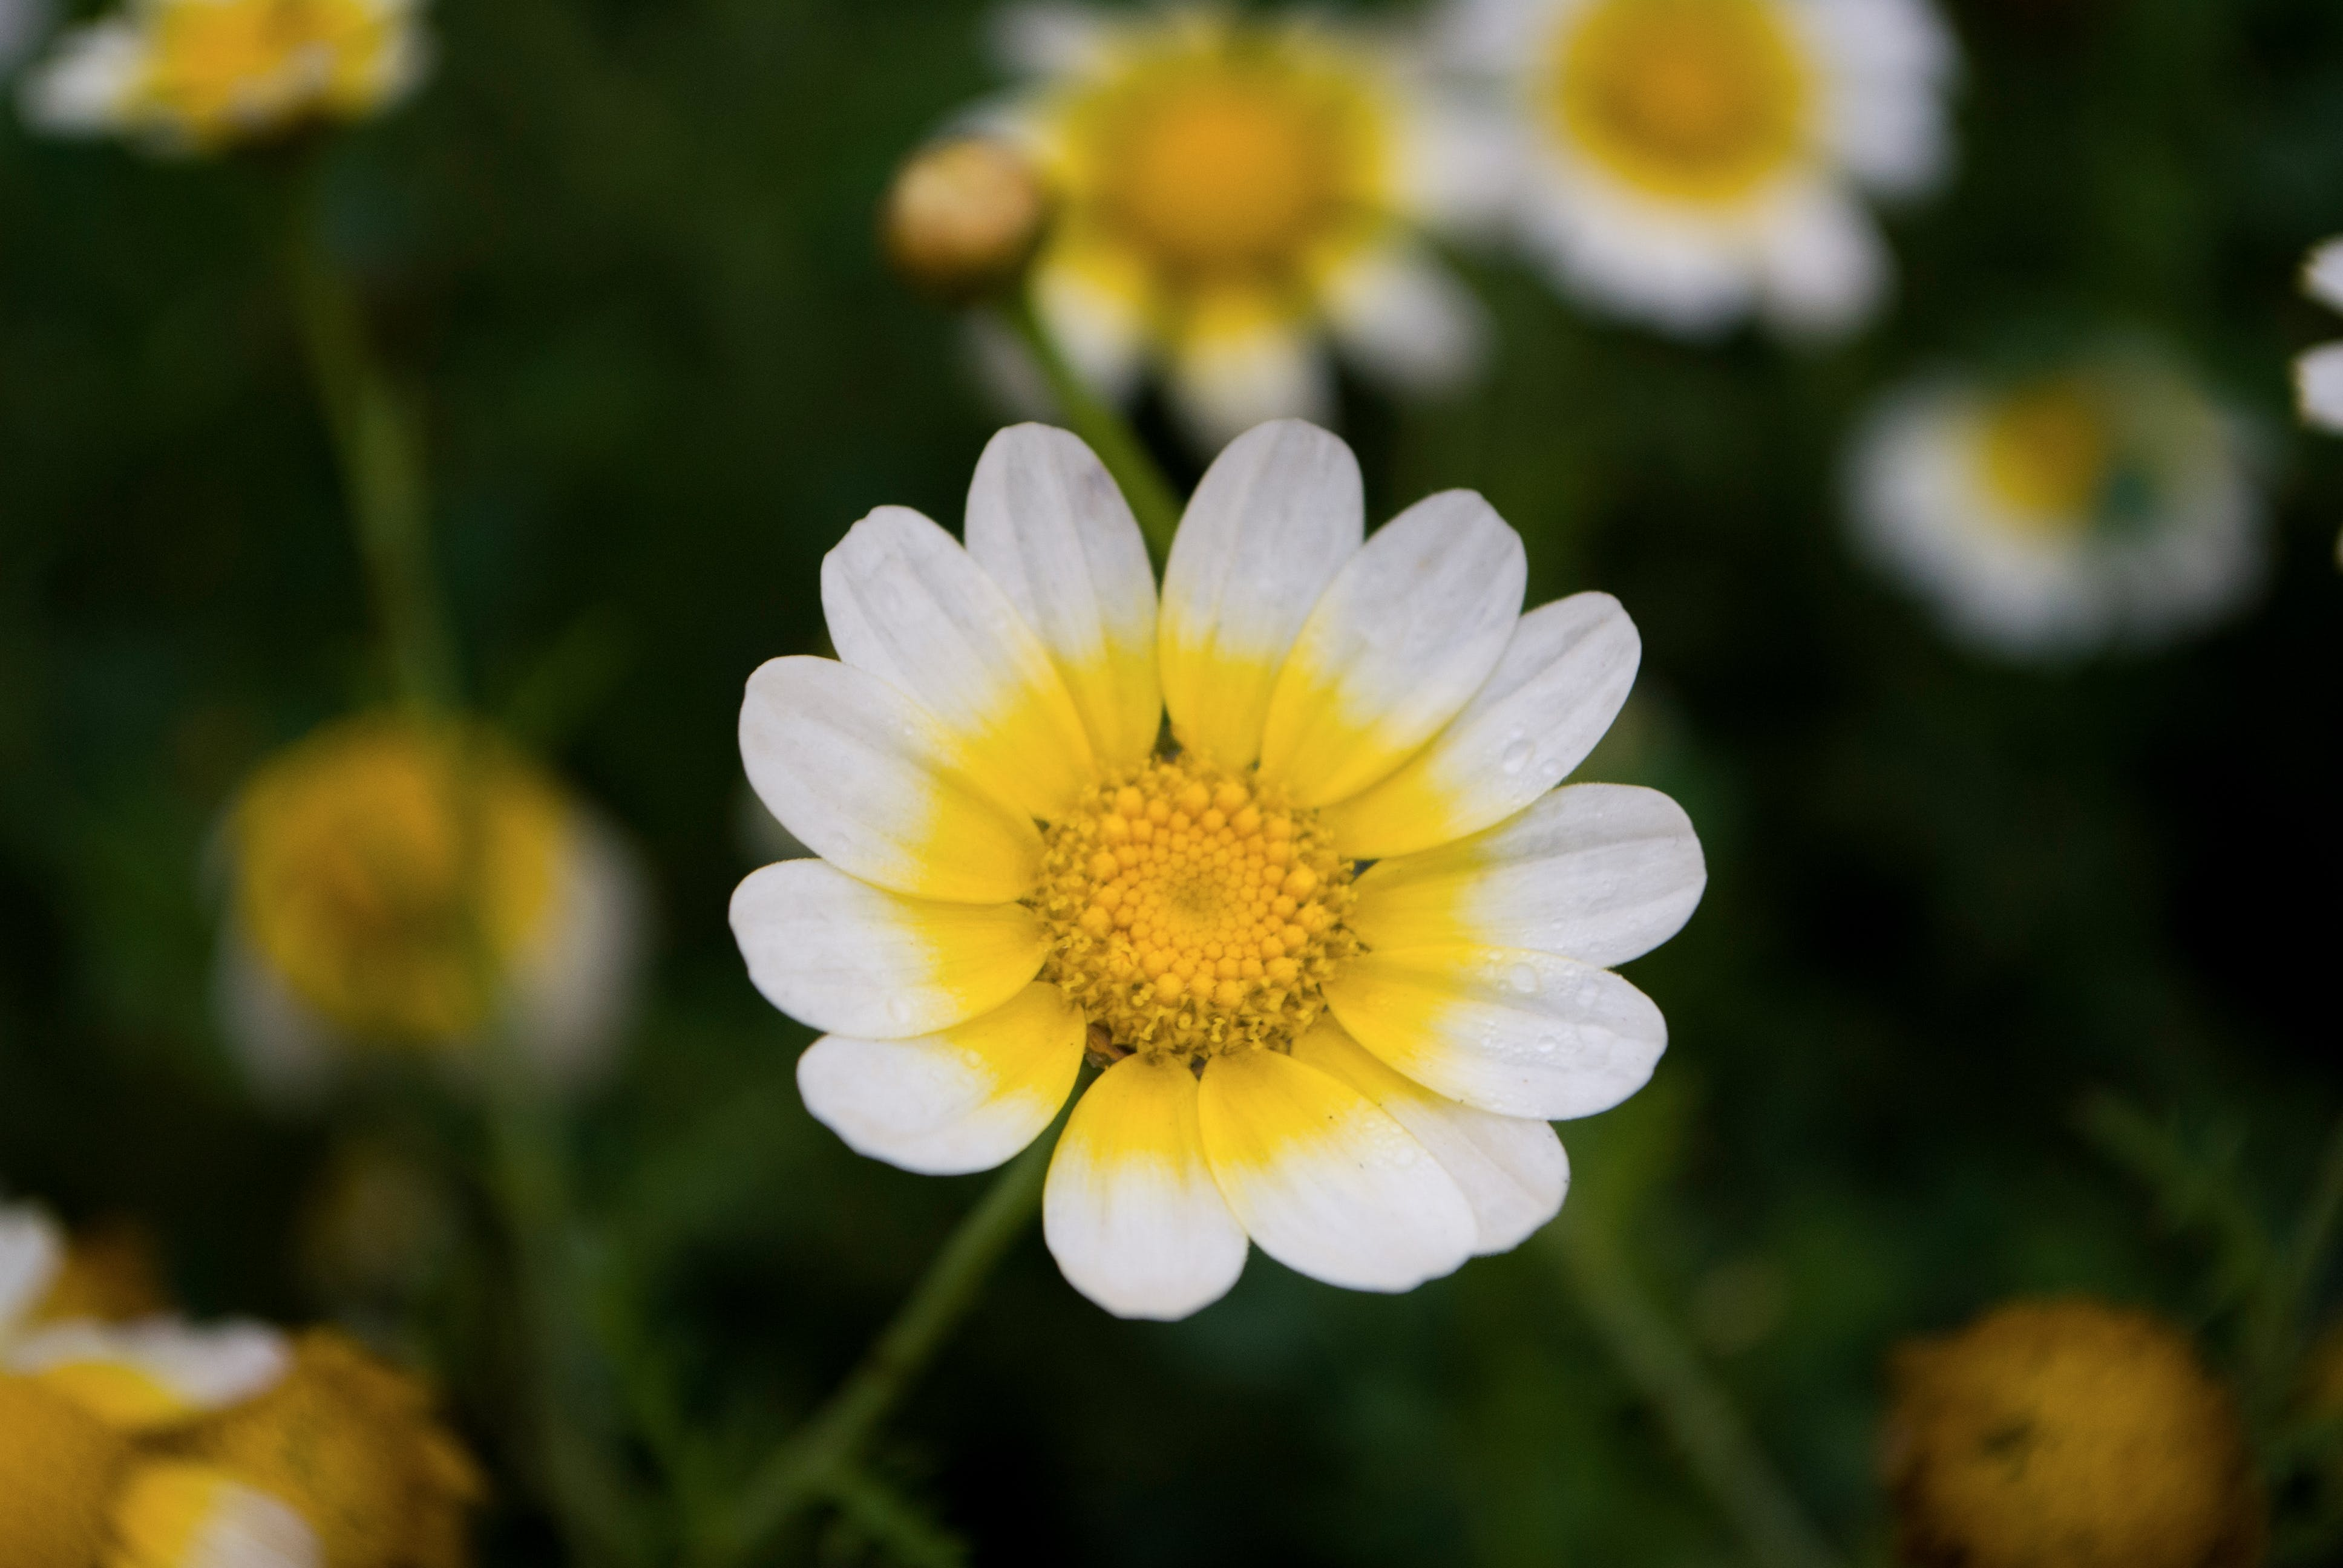 Shallow Focus Photography of Daisy Flower